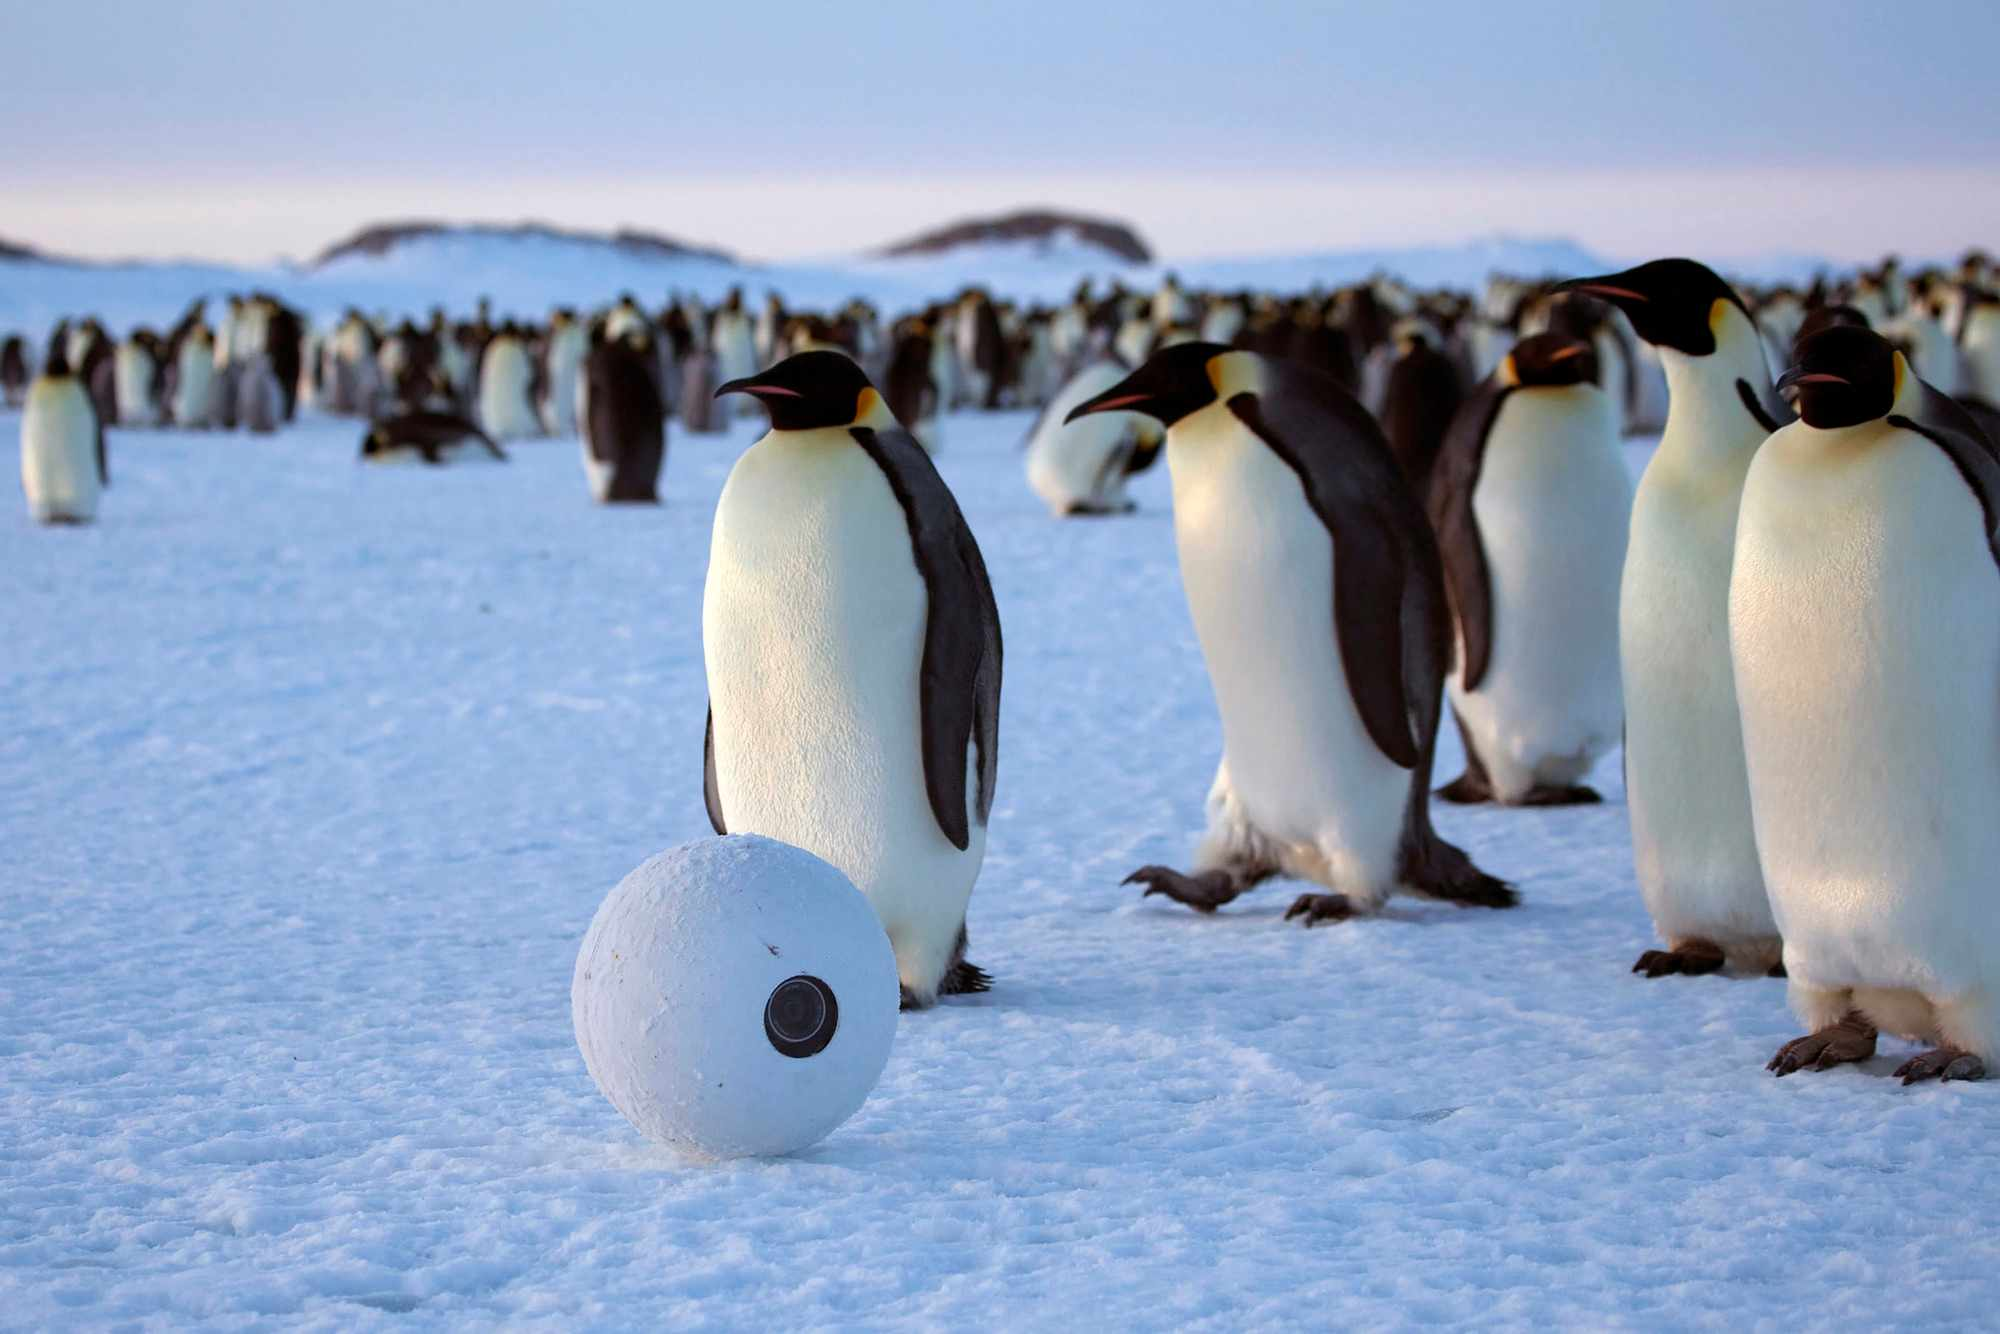 SnowballCam with emperor penguins, Antarctica. © BBC/John Downer Productions/Frederique Olivier